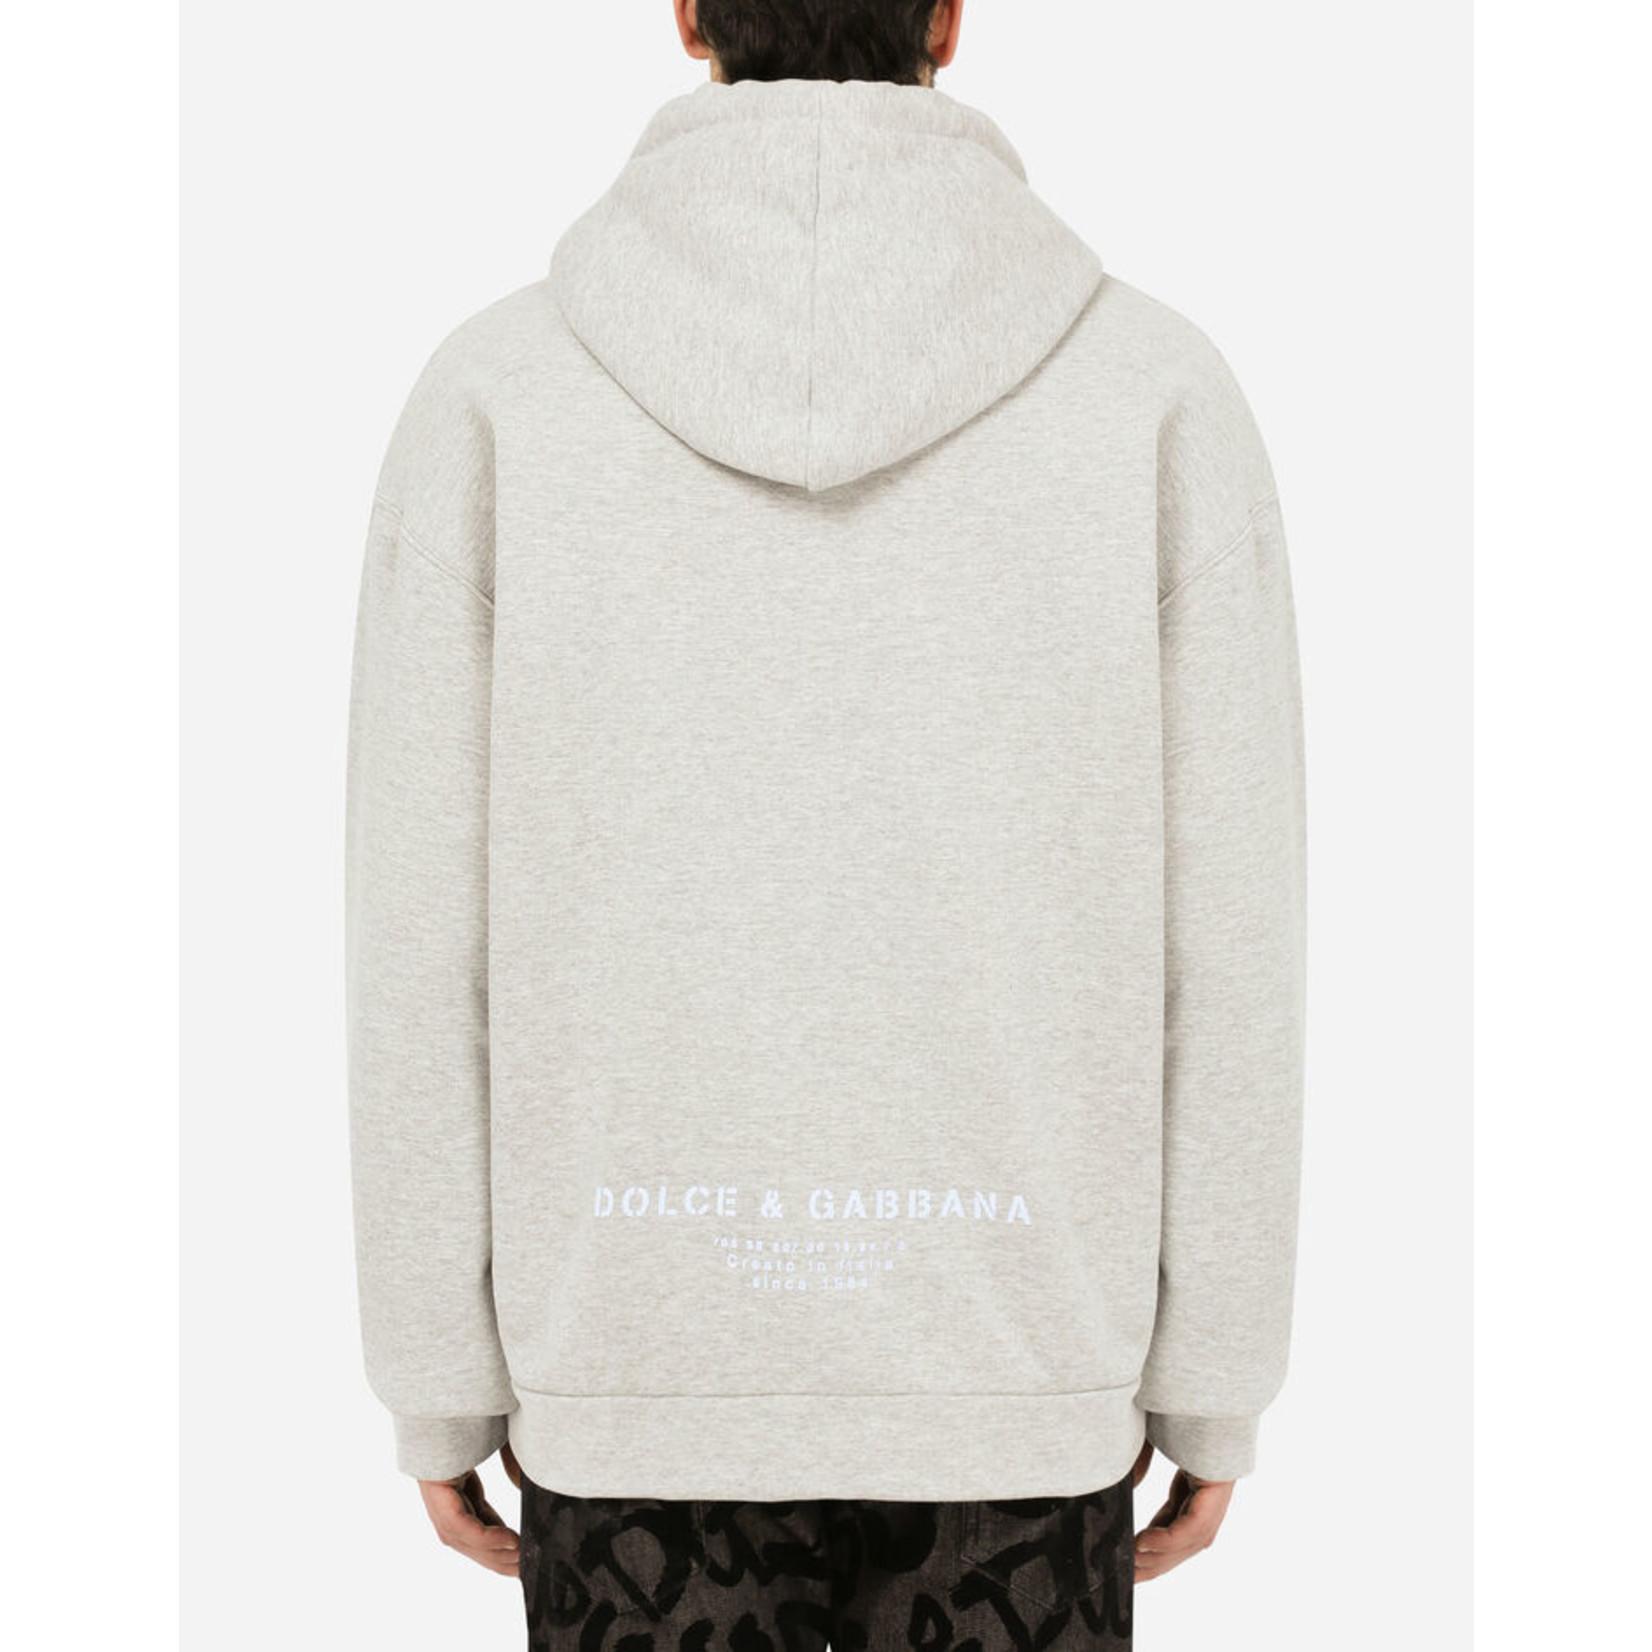 Dolce&Gabbana Sweatshirt 42615